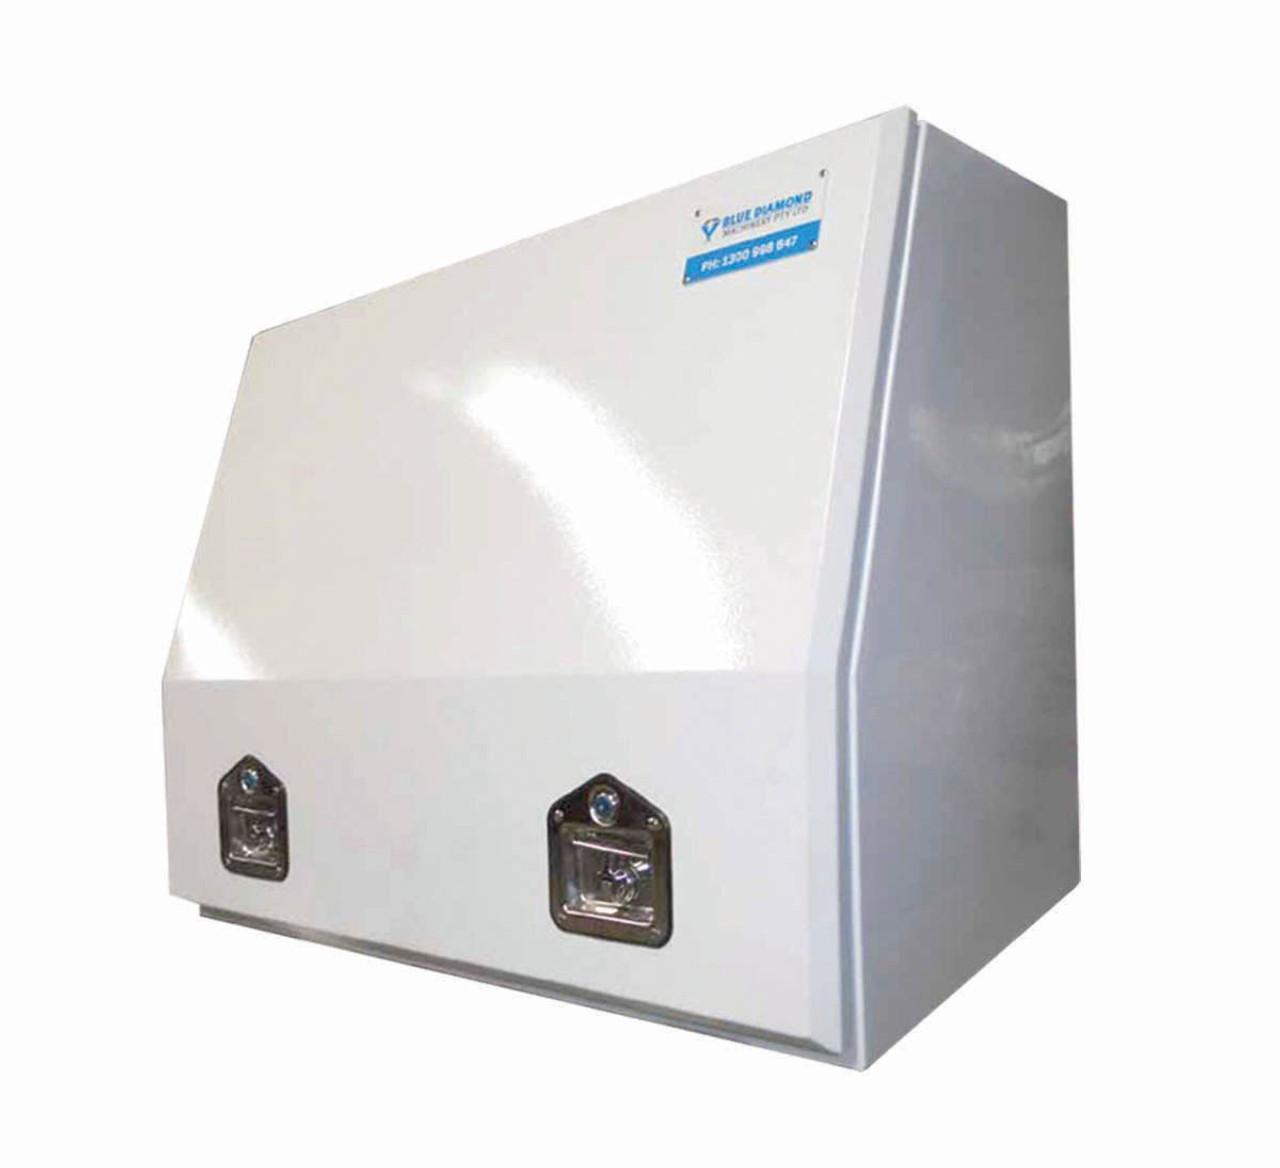 Full Door Steel Tool Box for Ute or Truck